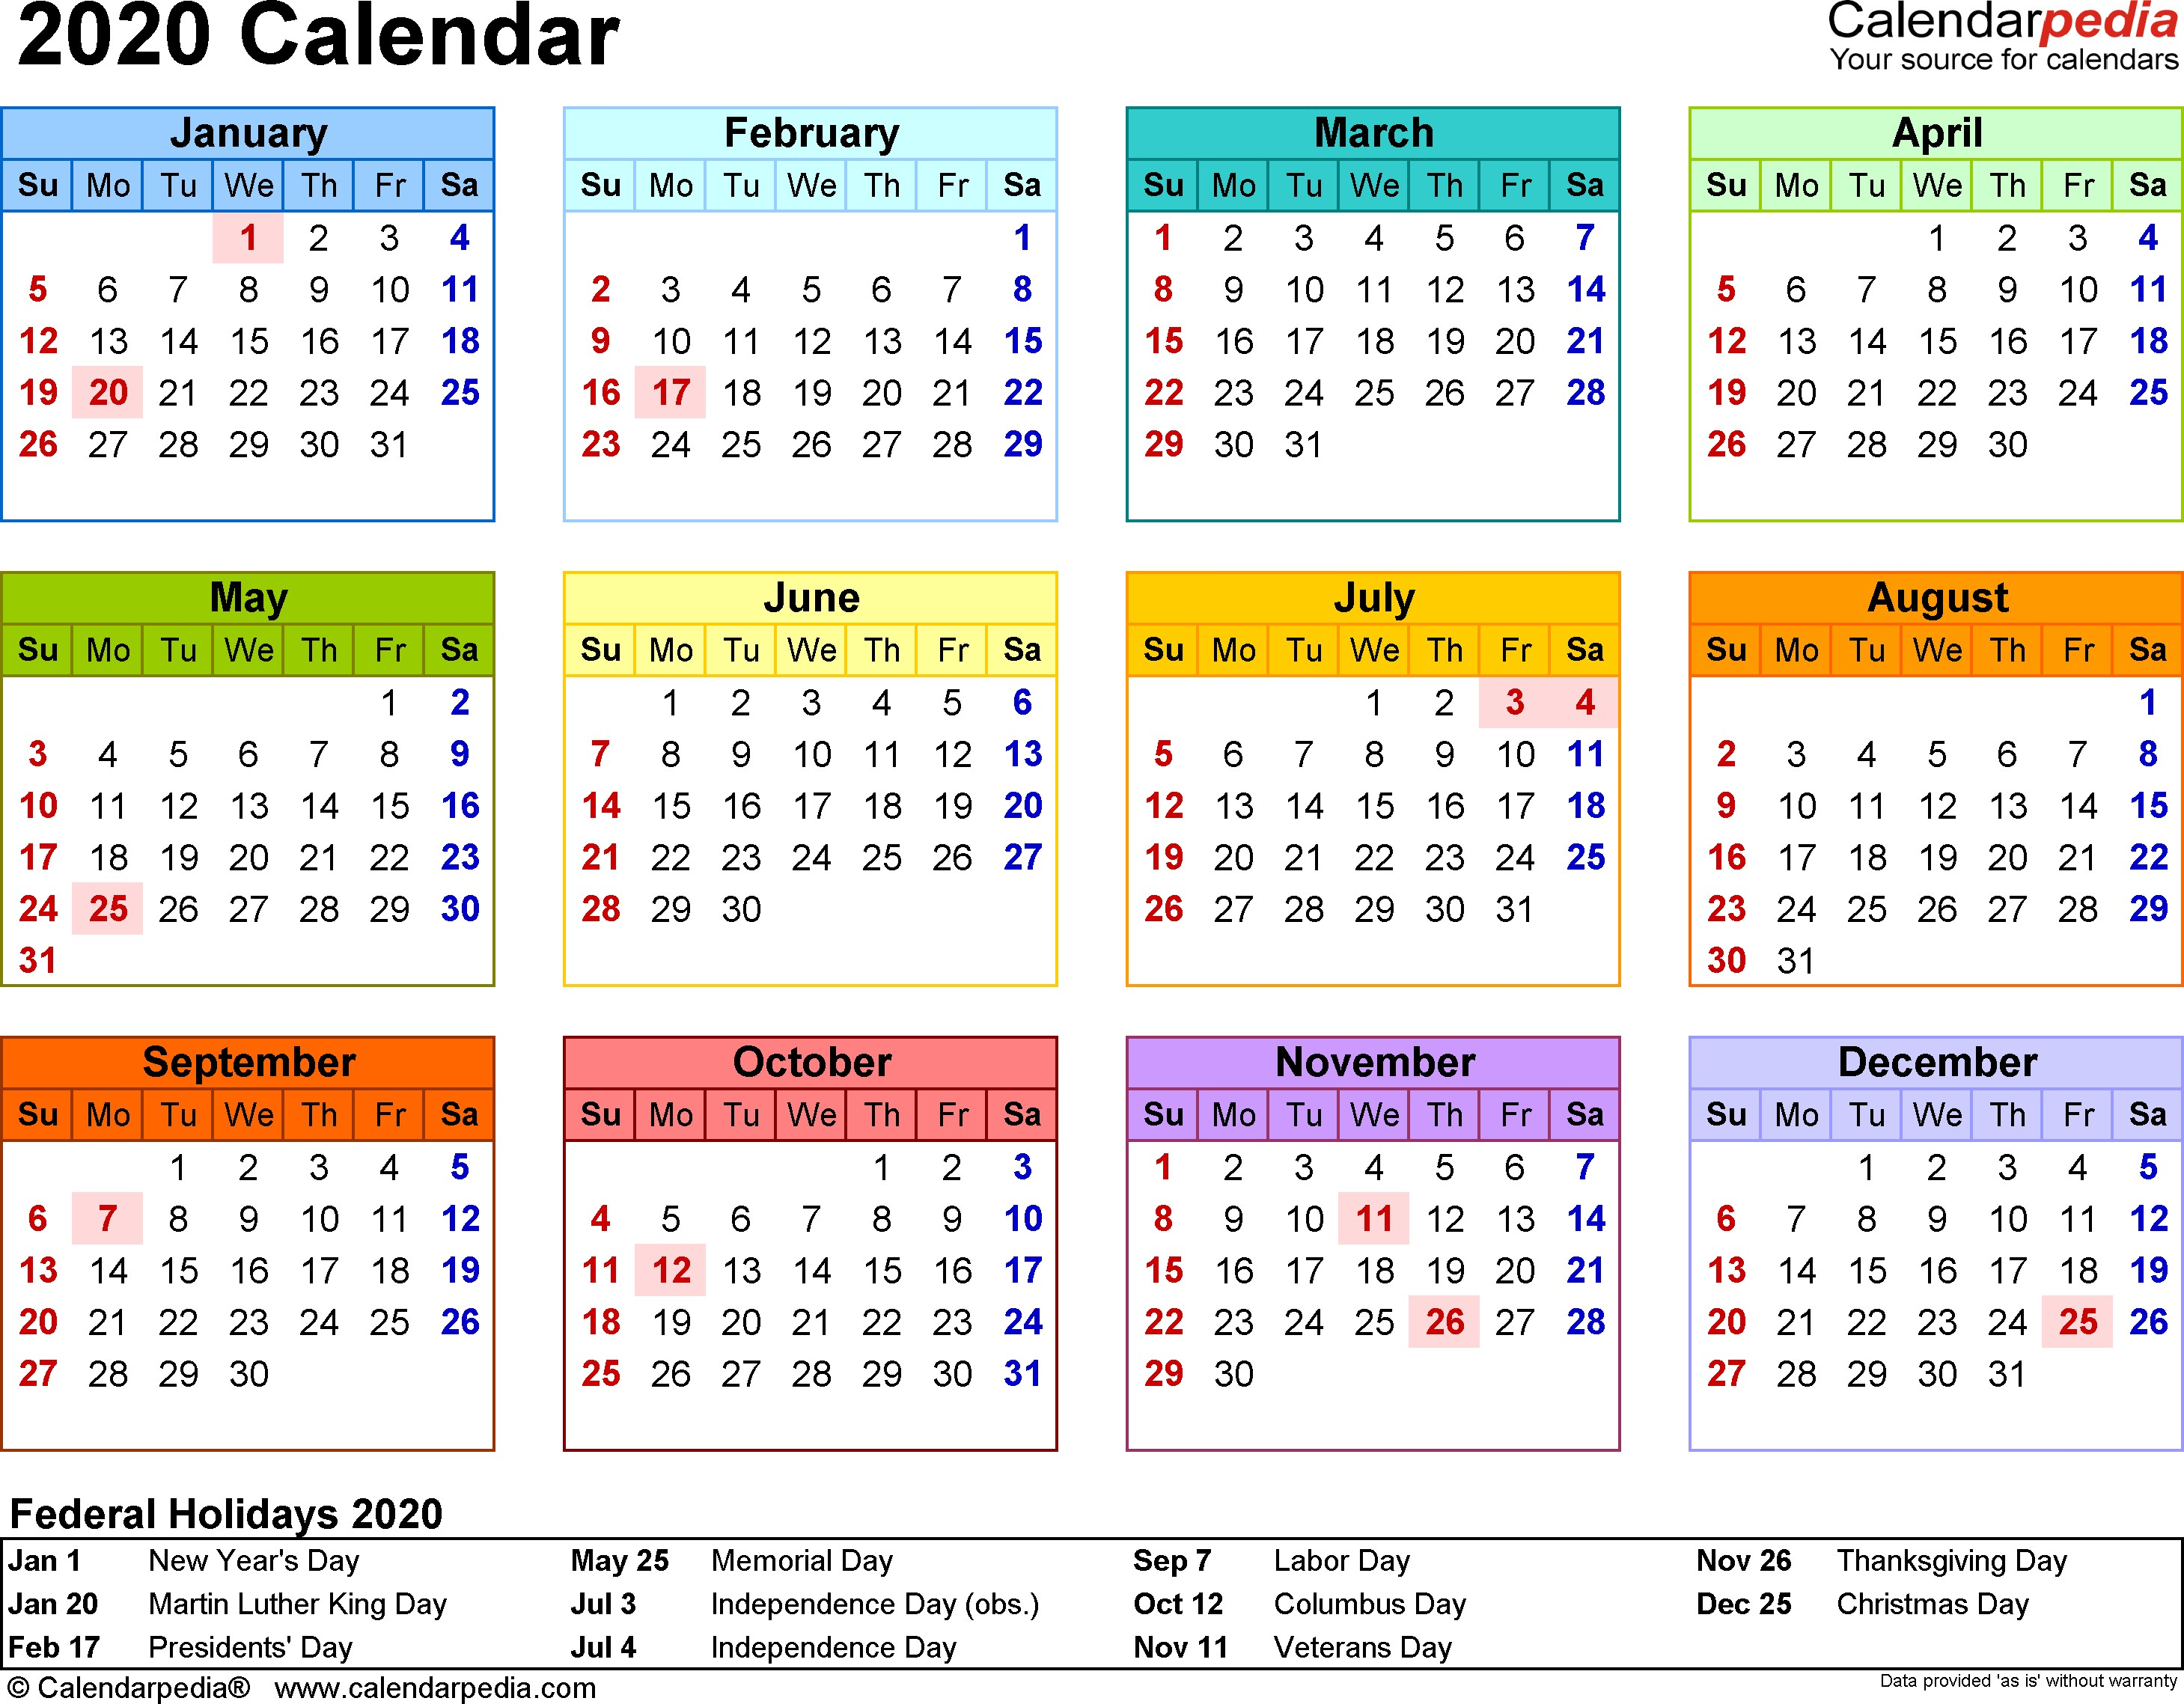 Free Printable 2020 Calendar Templates 2020 Calendar 17 Free Printable Word Calendar Templates